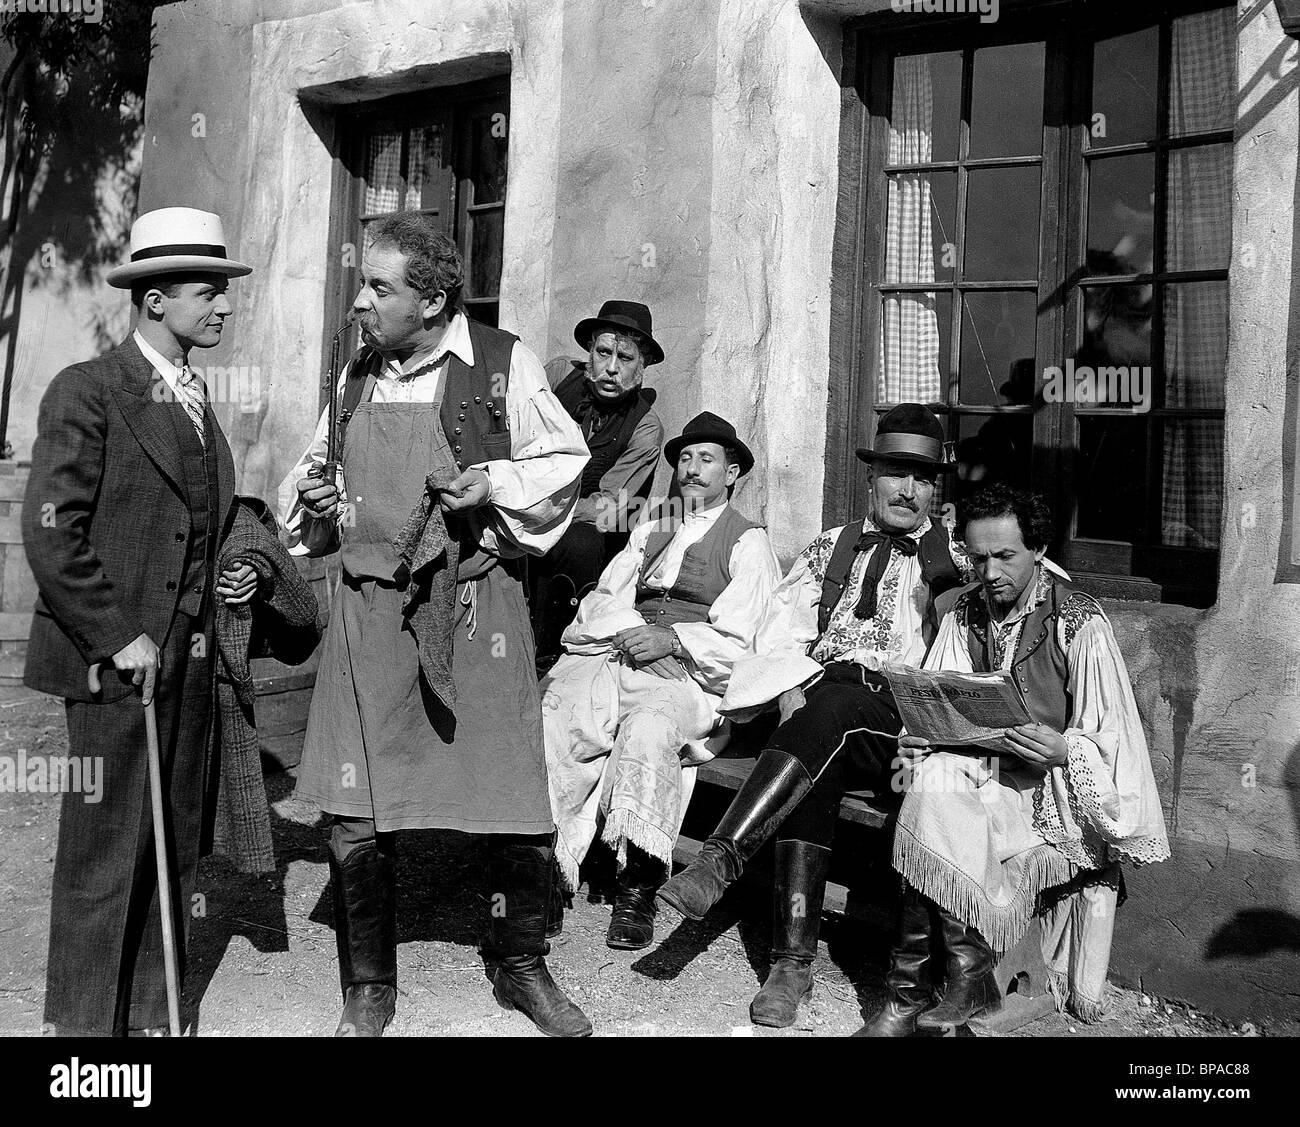 DWIGHT FRYE DRACULA (1931) - Stock Image